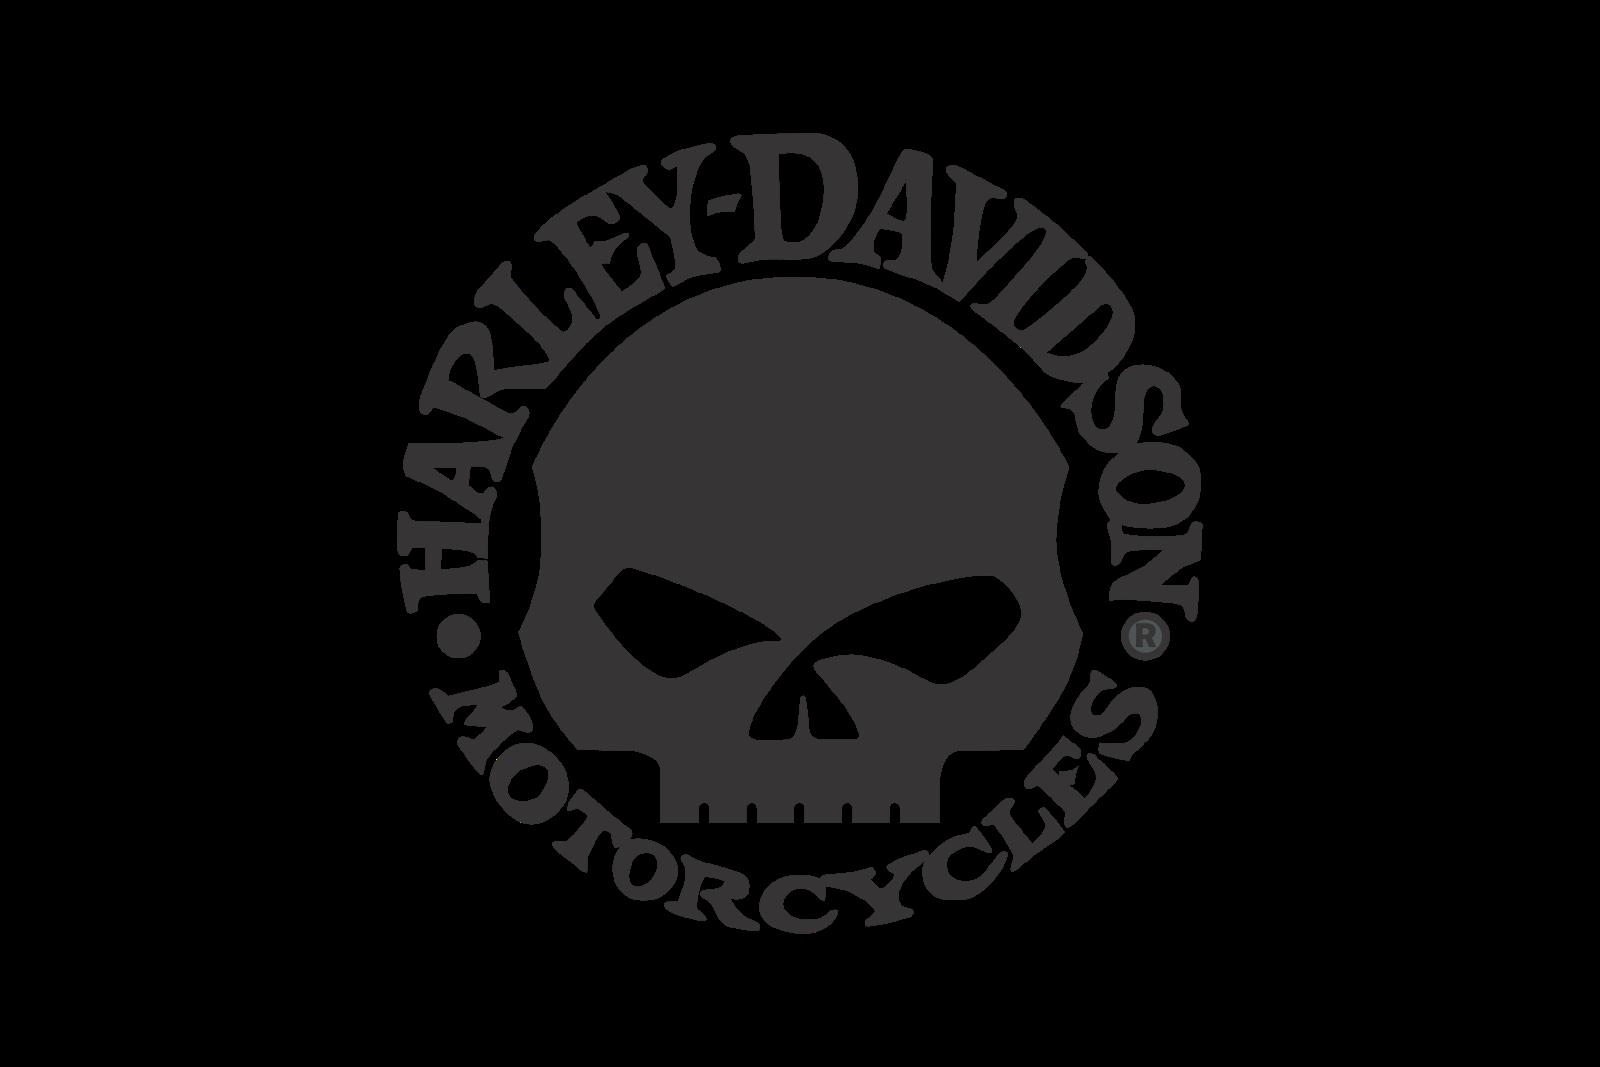 Harley Davidson Skull Logo LogoShare